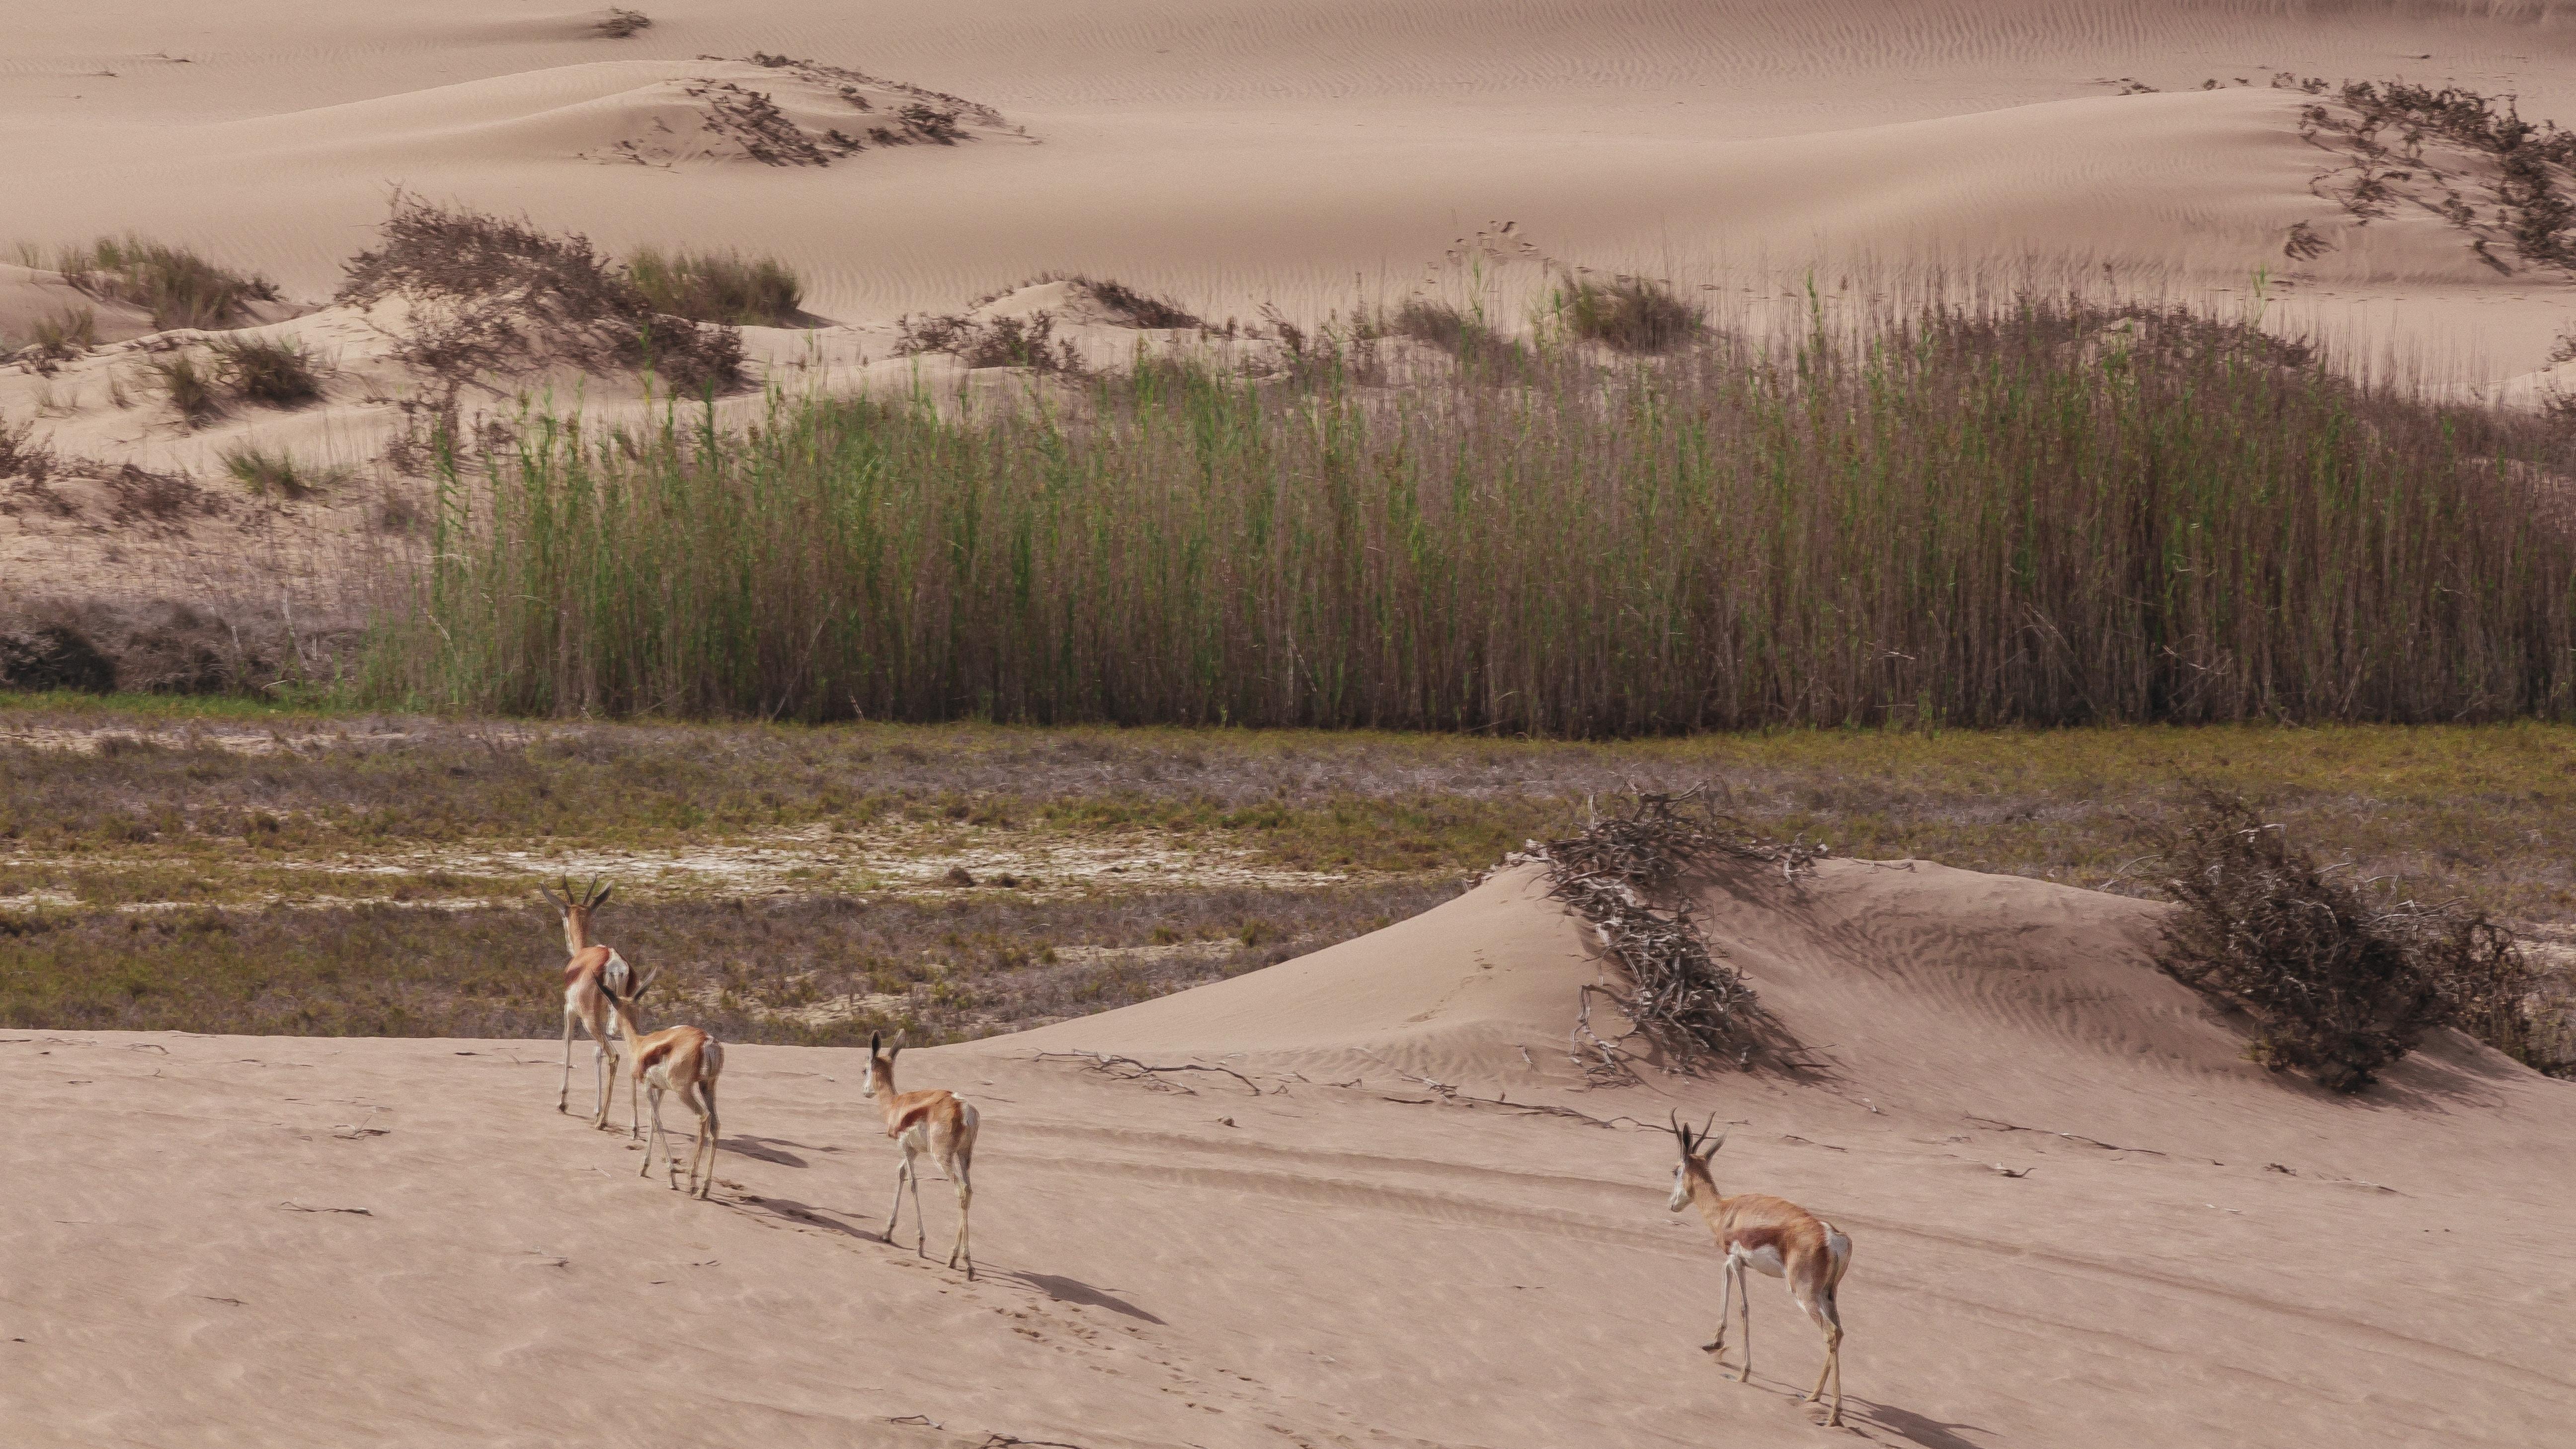 four animal walking towars the green trees painting